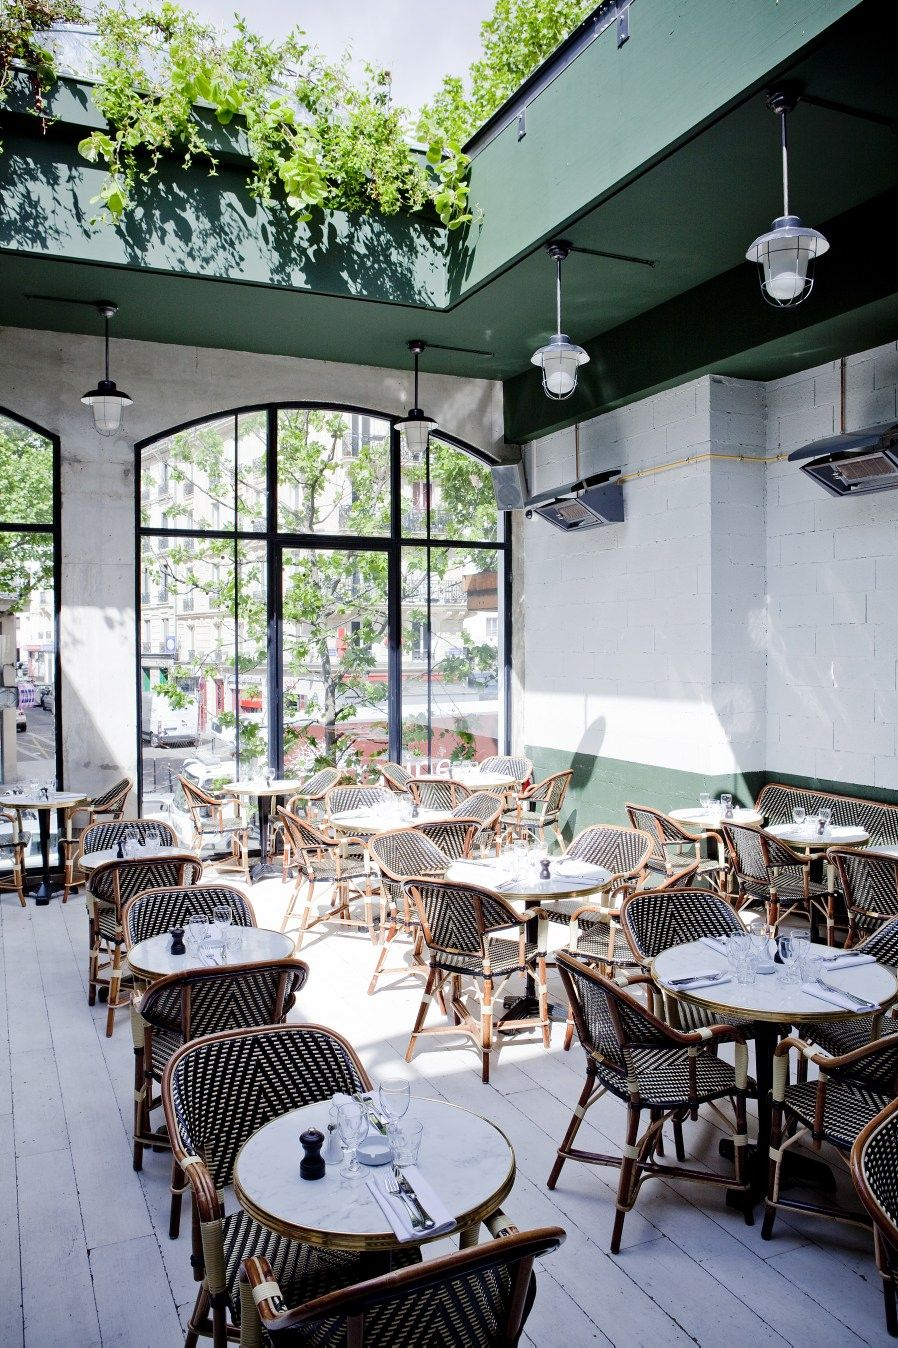 Paris Match Design Interieur De Cafe Terrasse Paris Brasserie Barbes